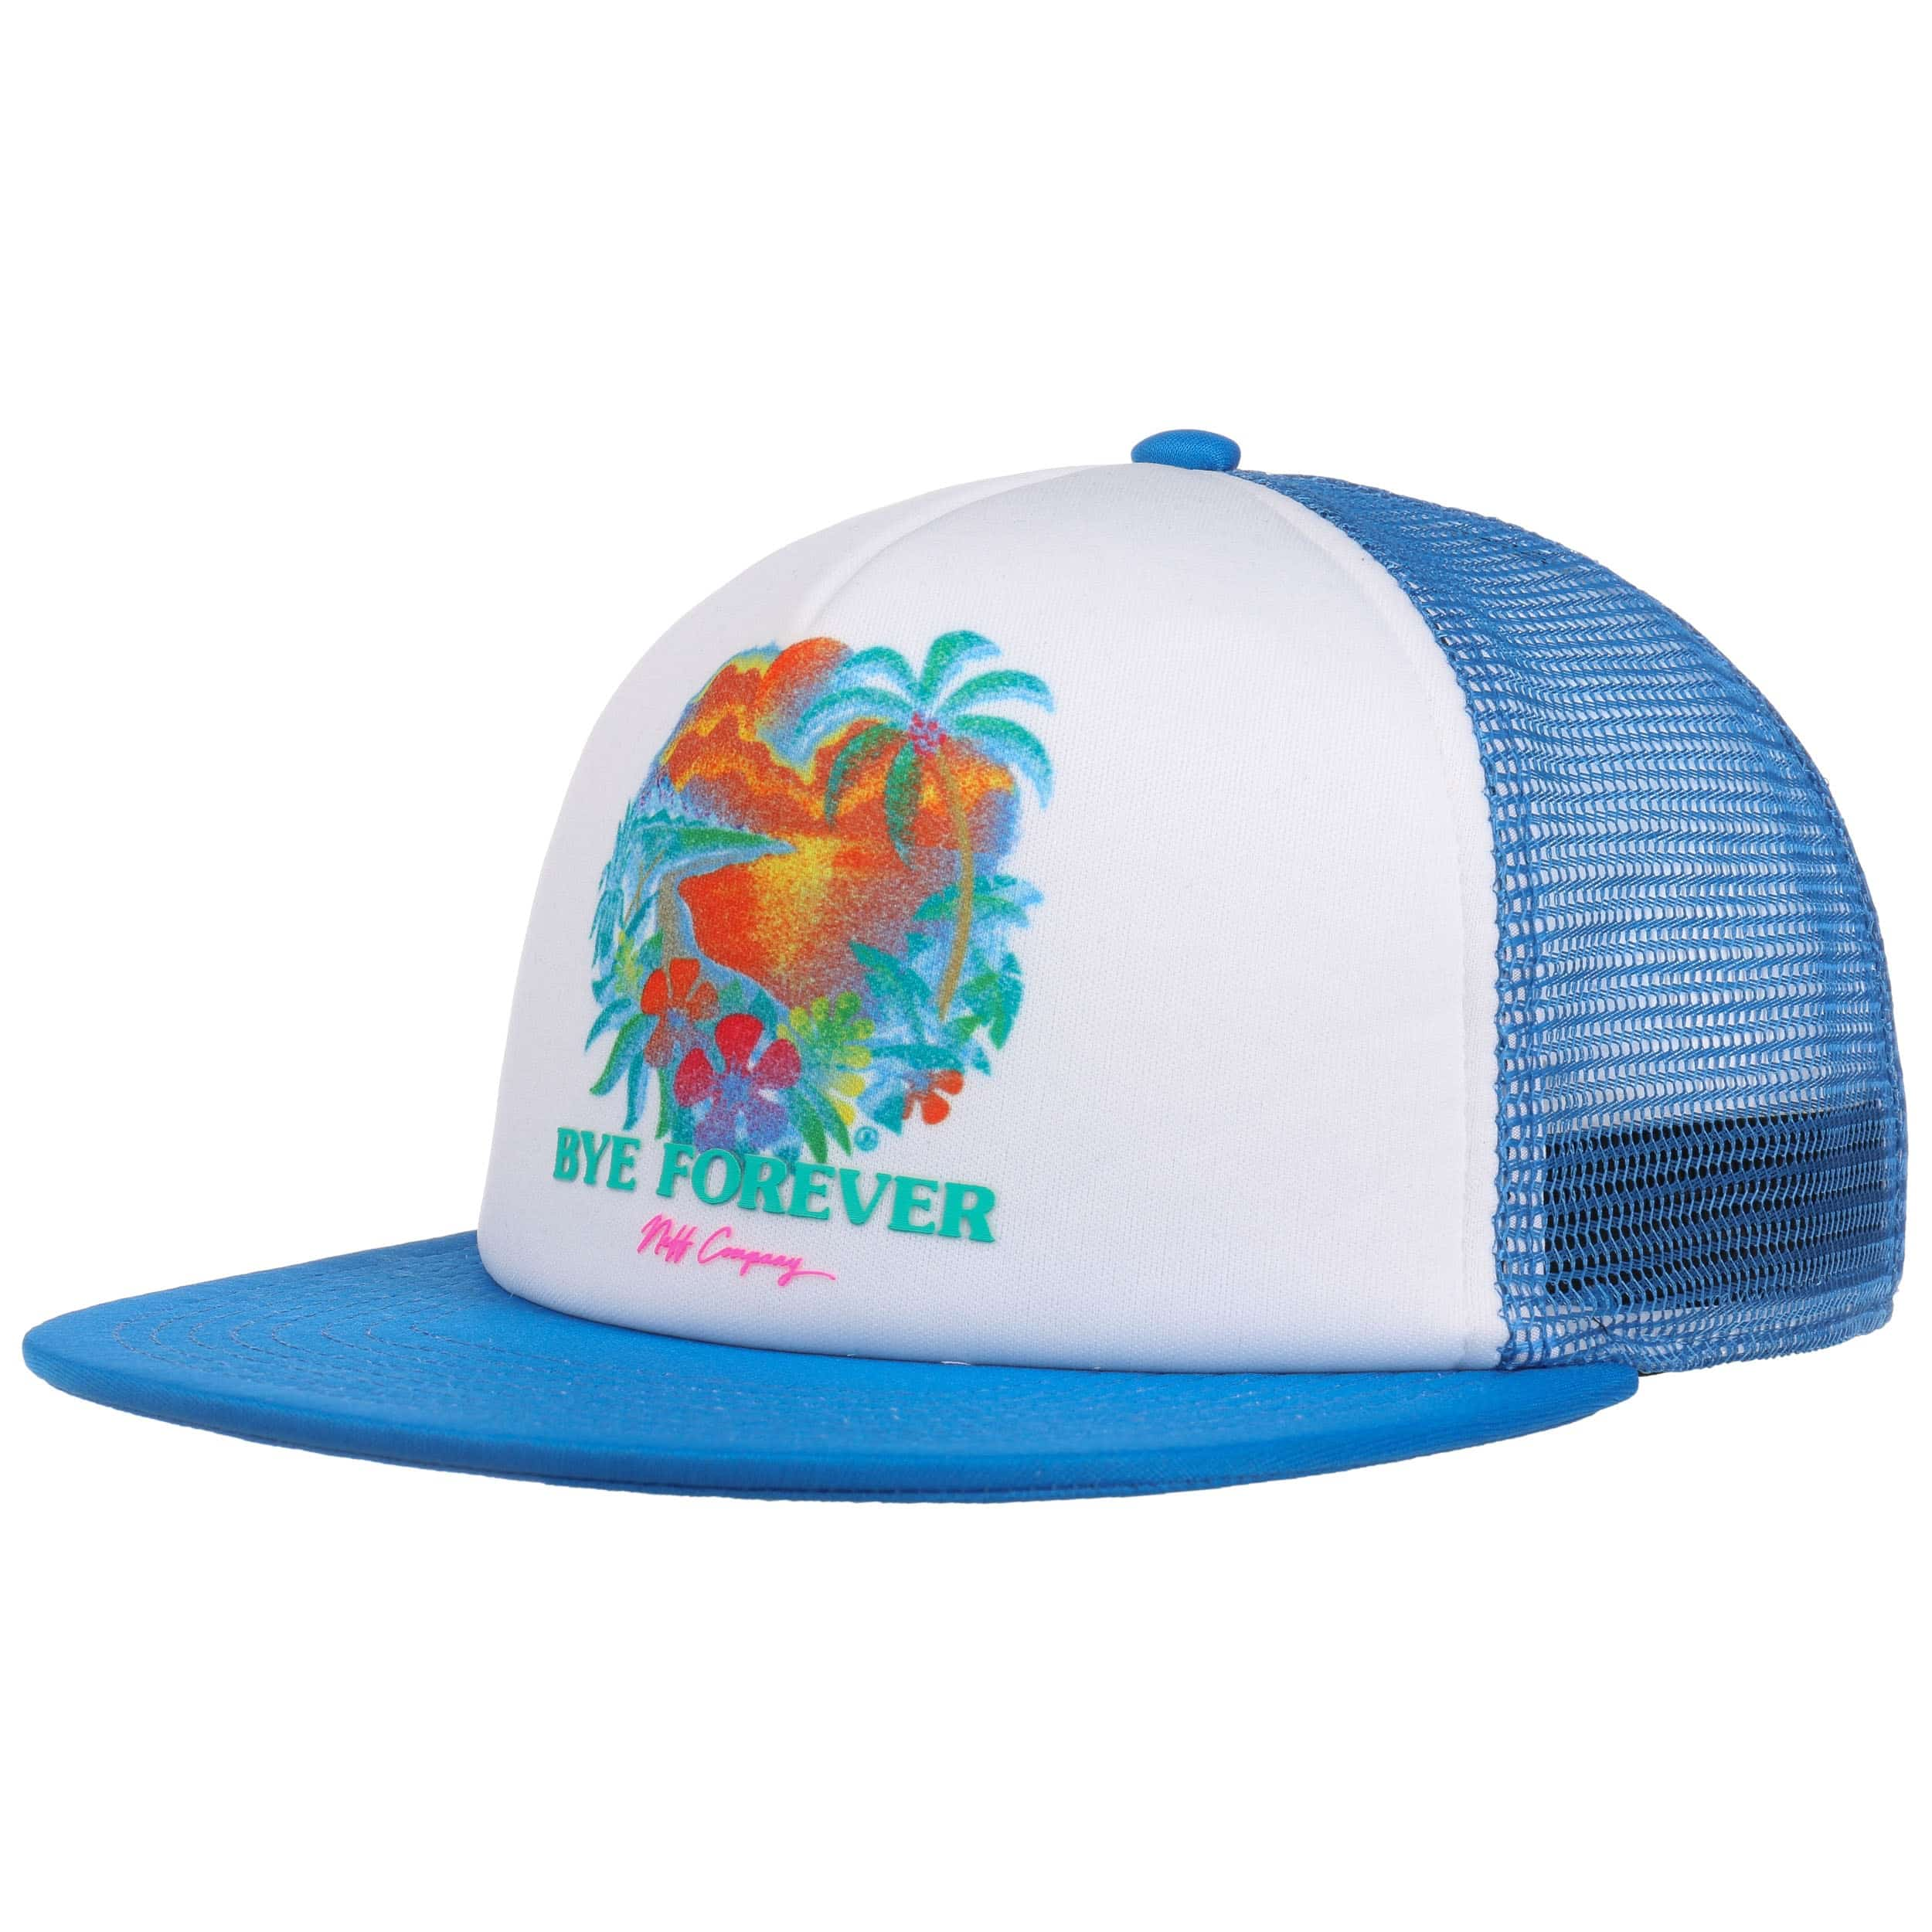 a066551b3d0 ... Orphan Trucker Cap by Neff - royal-blue 6